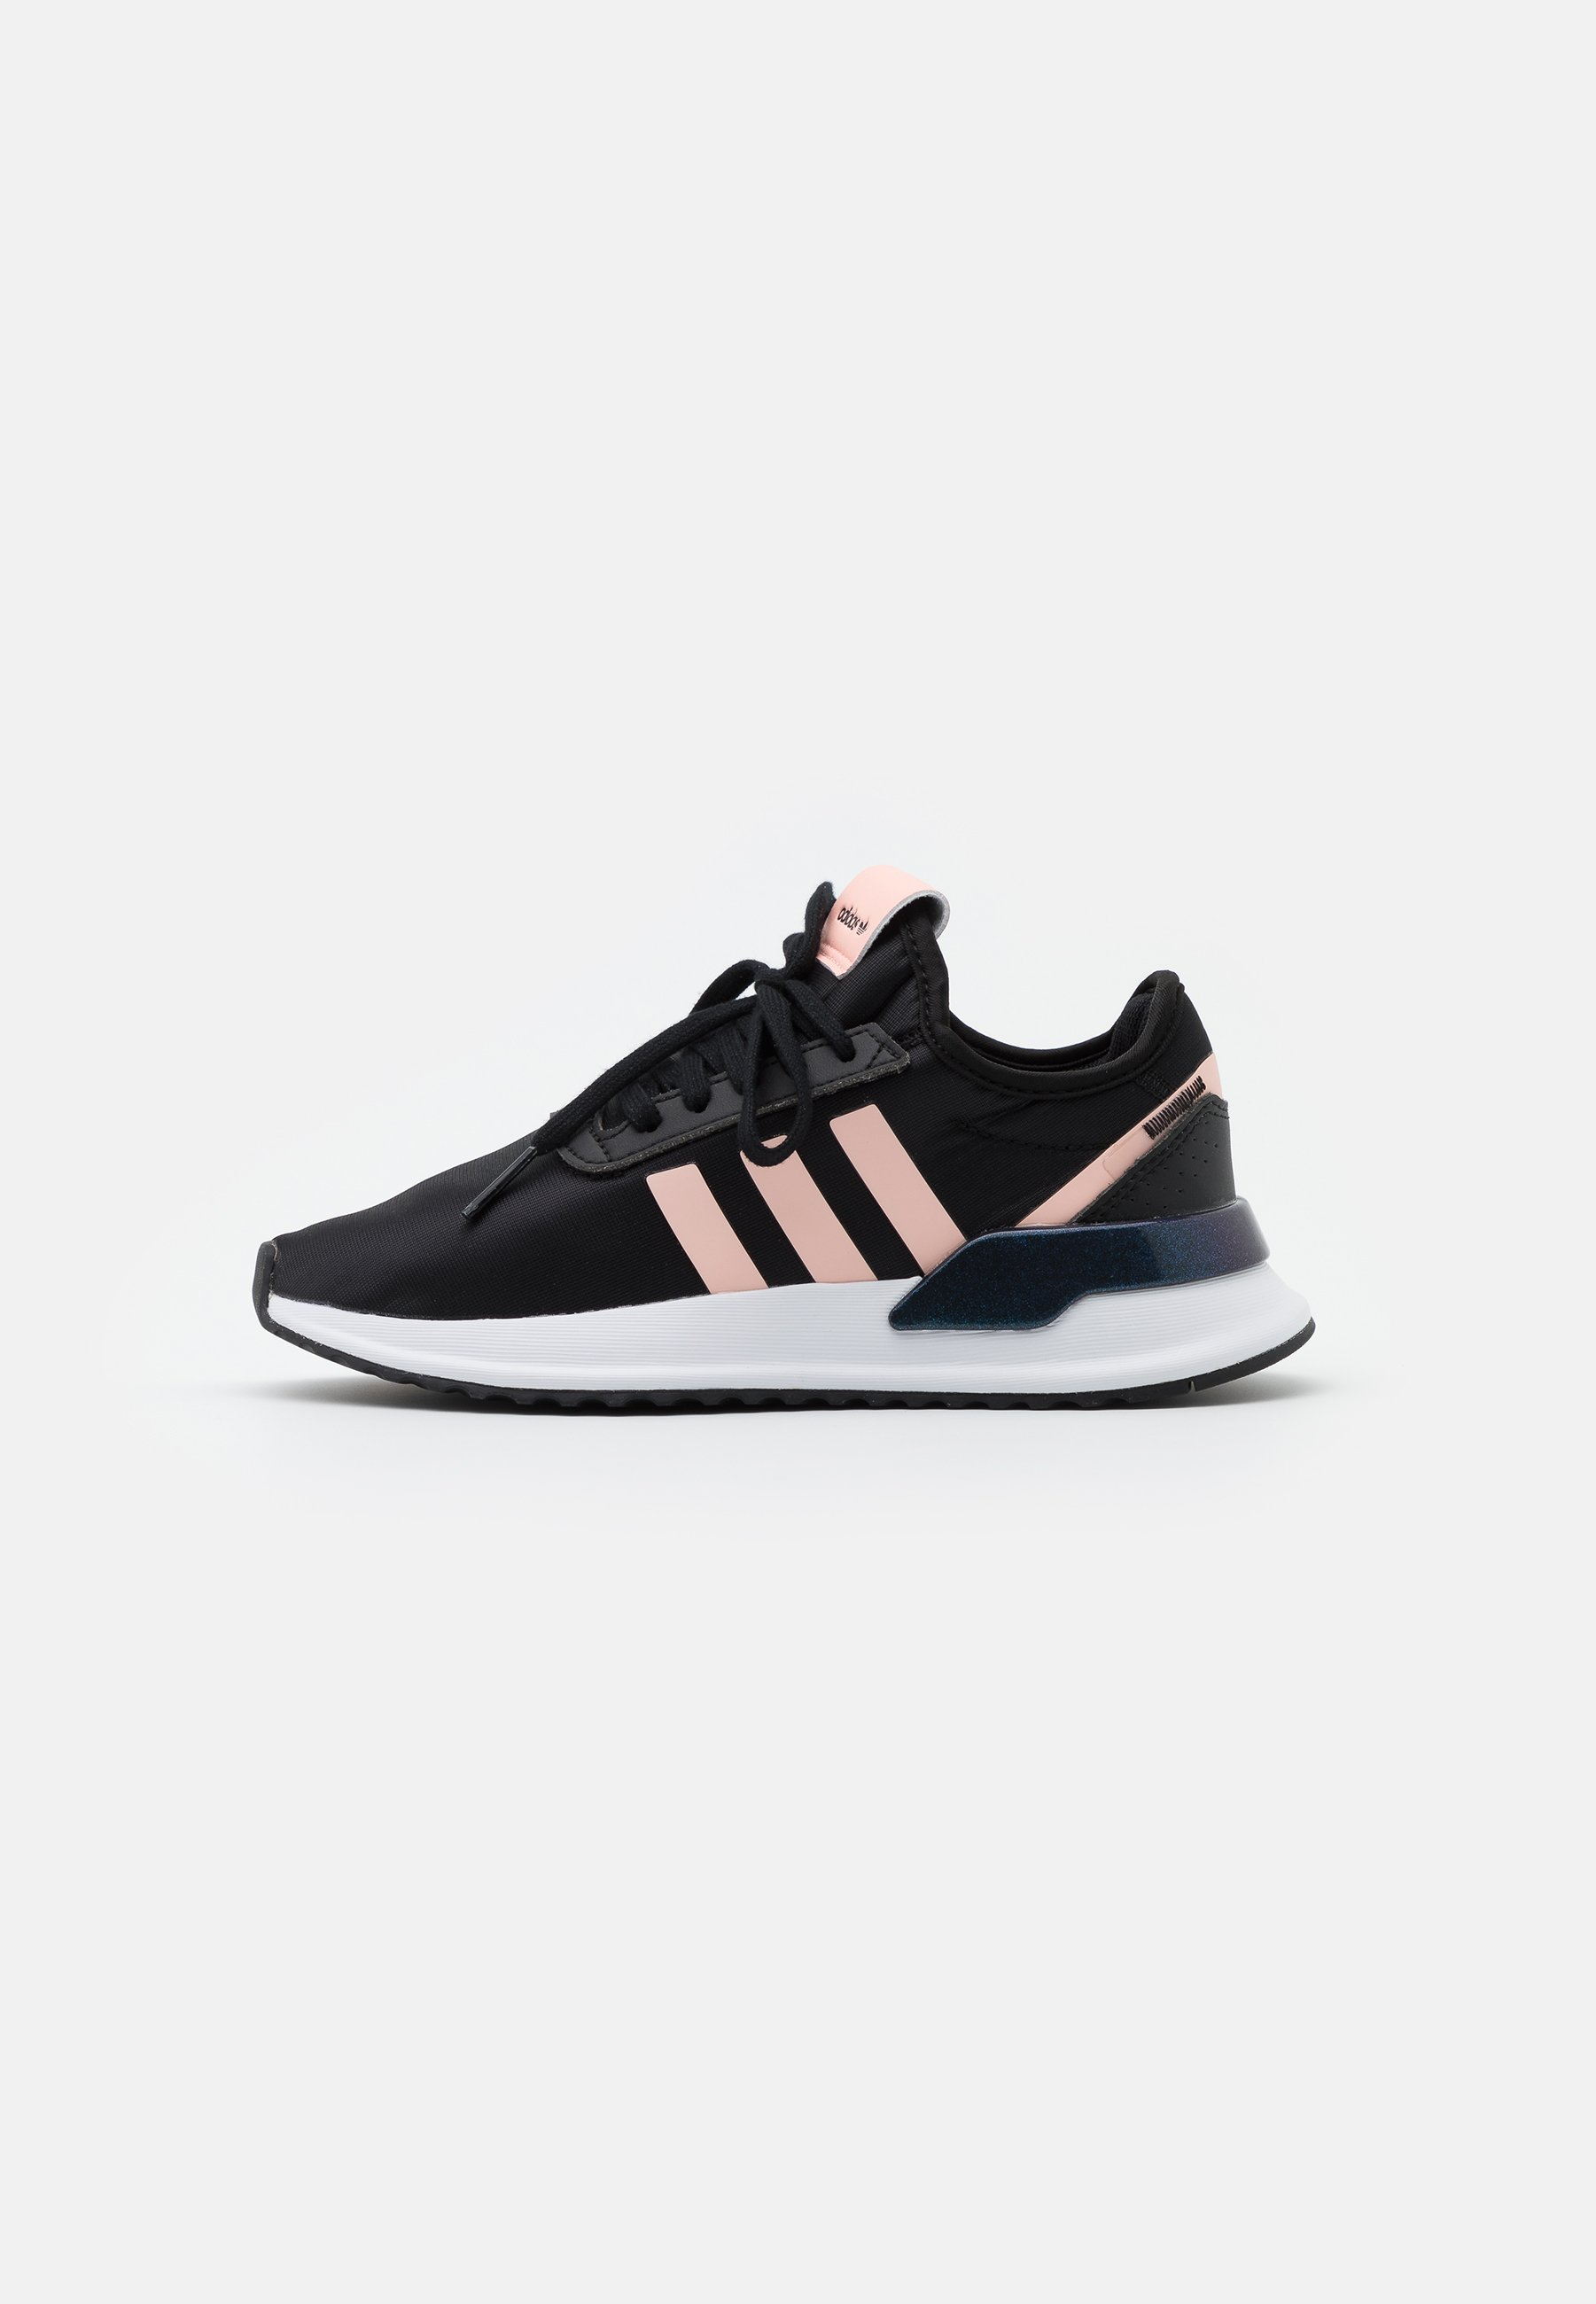 Adidas Løpesko | Dame | Nye joggesko på nett hos Zalando Sport